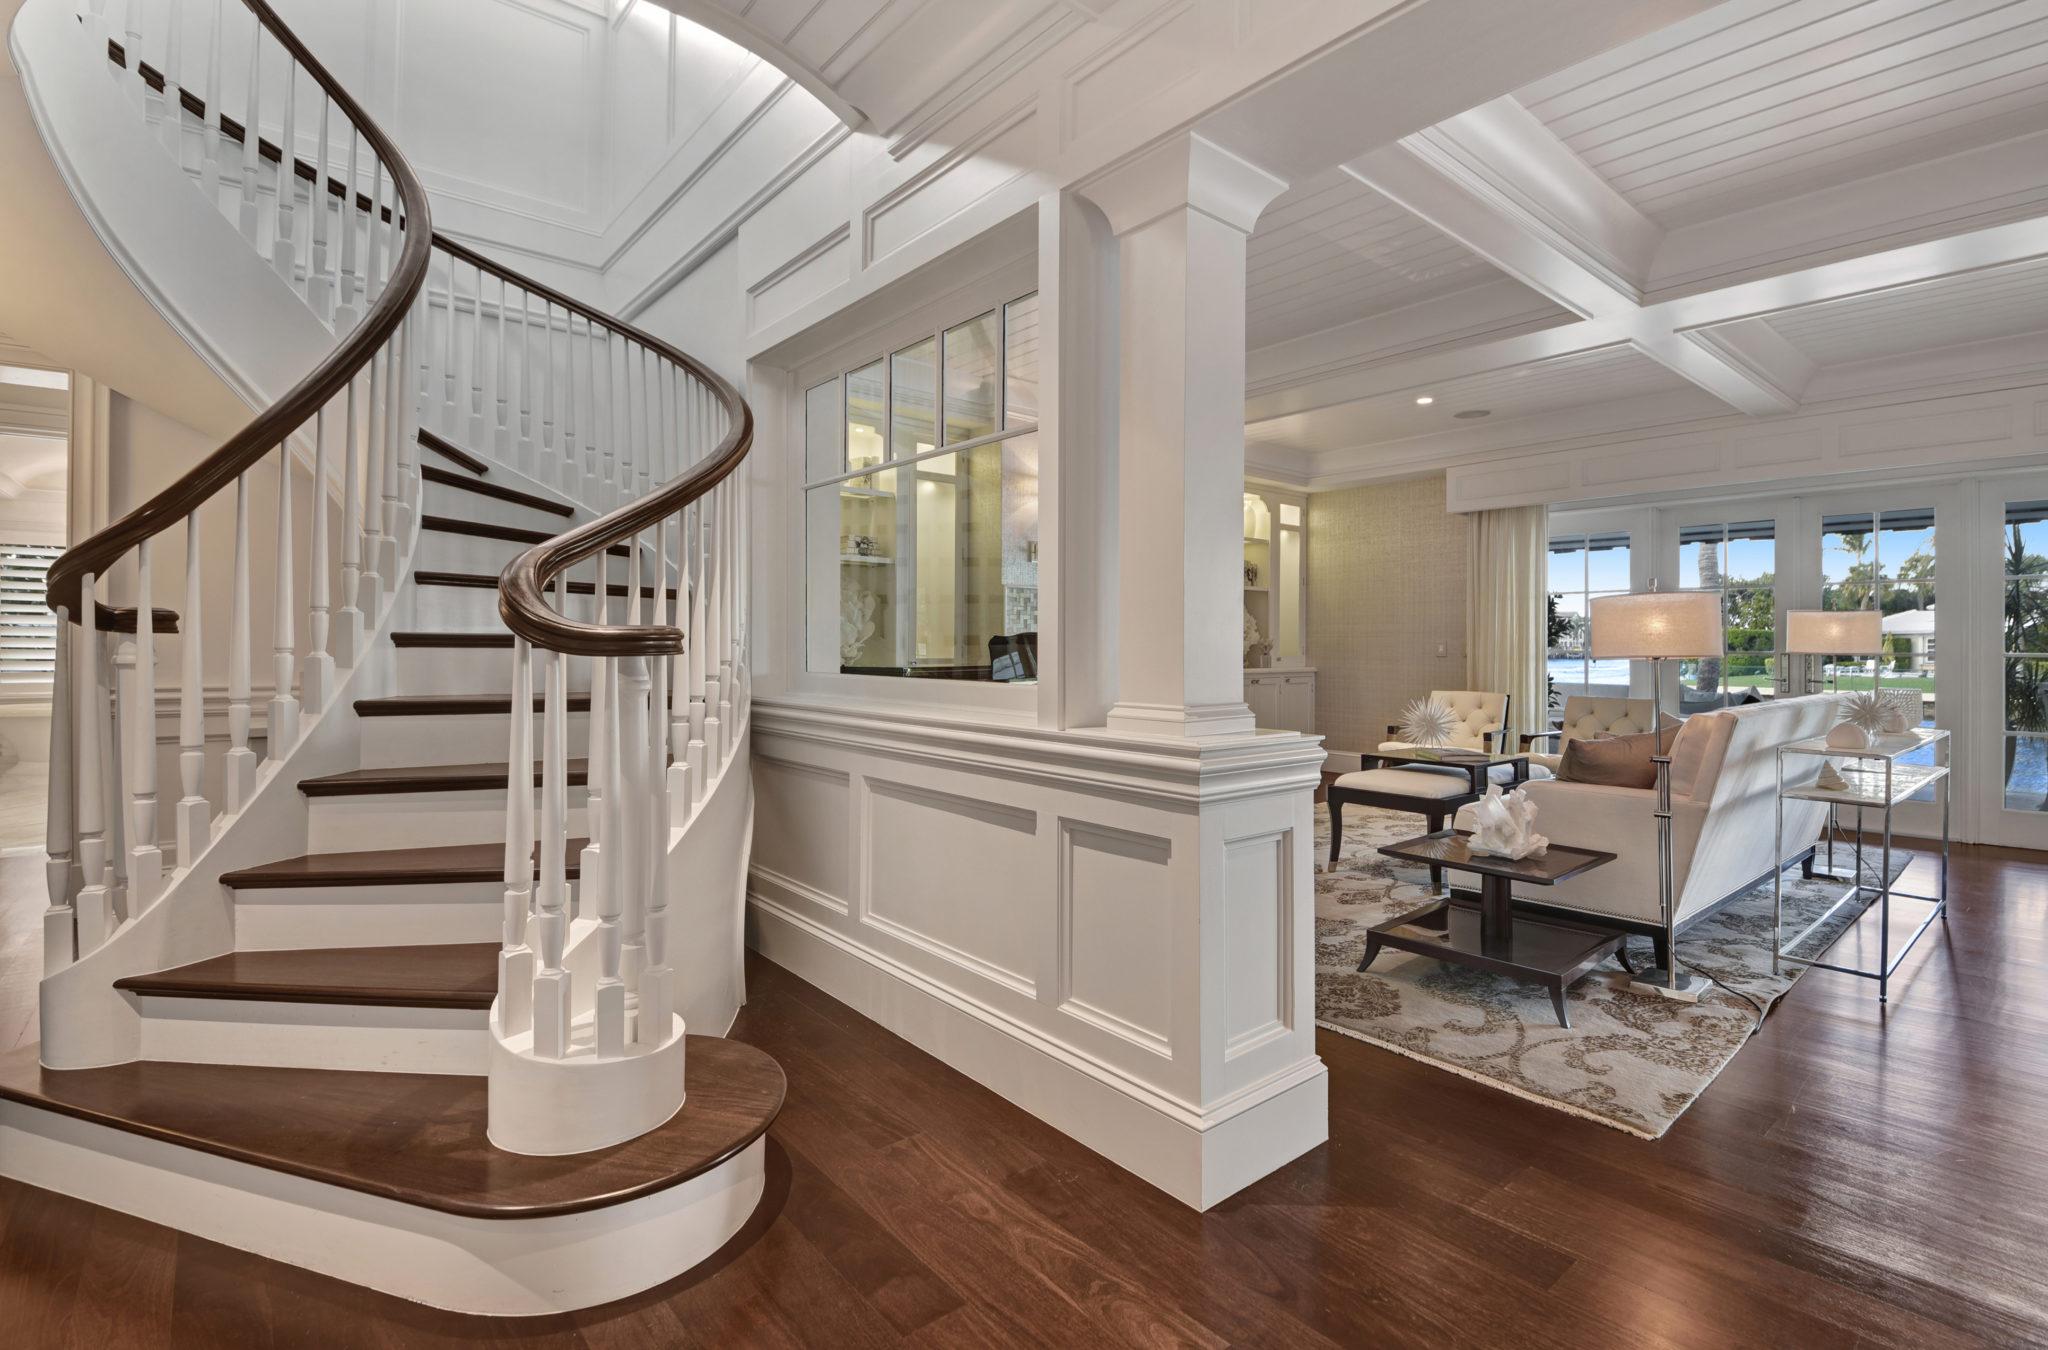 Delray Beach, FL Residence 11 - Architectural Design Studios